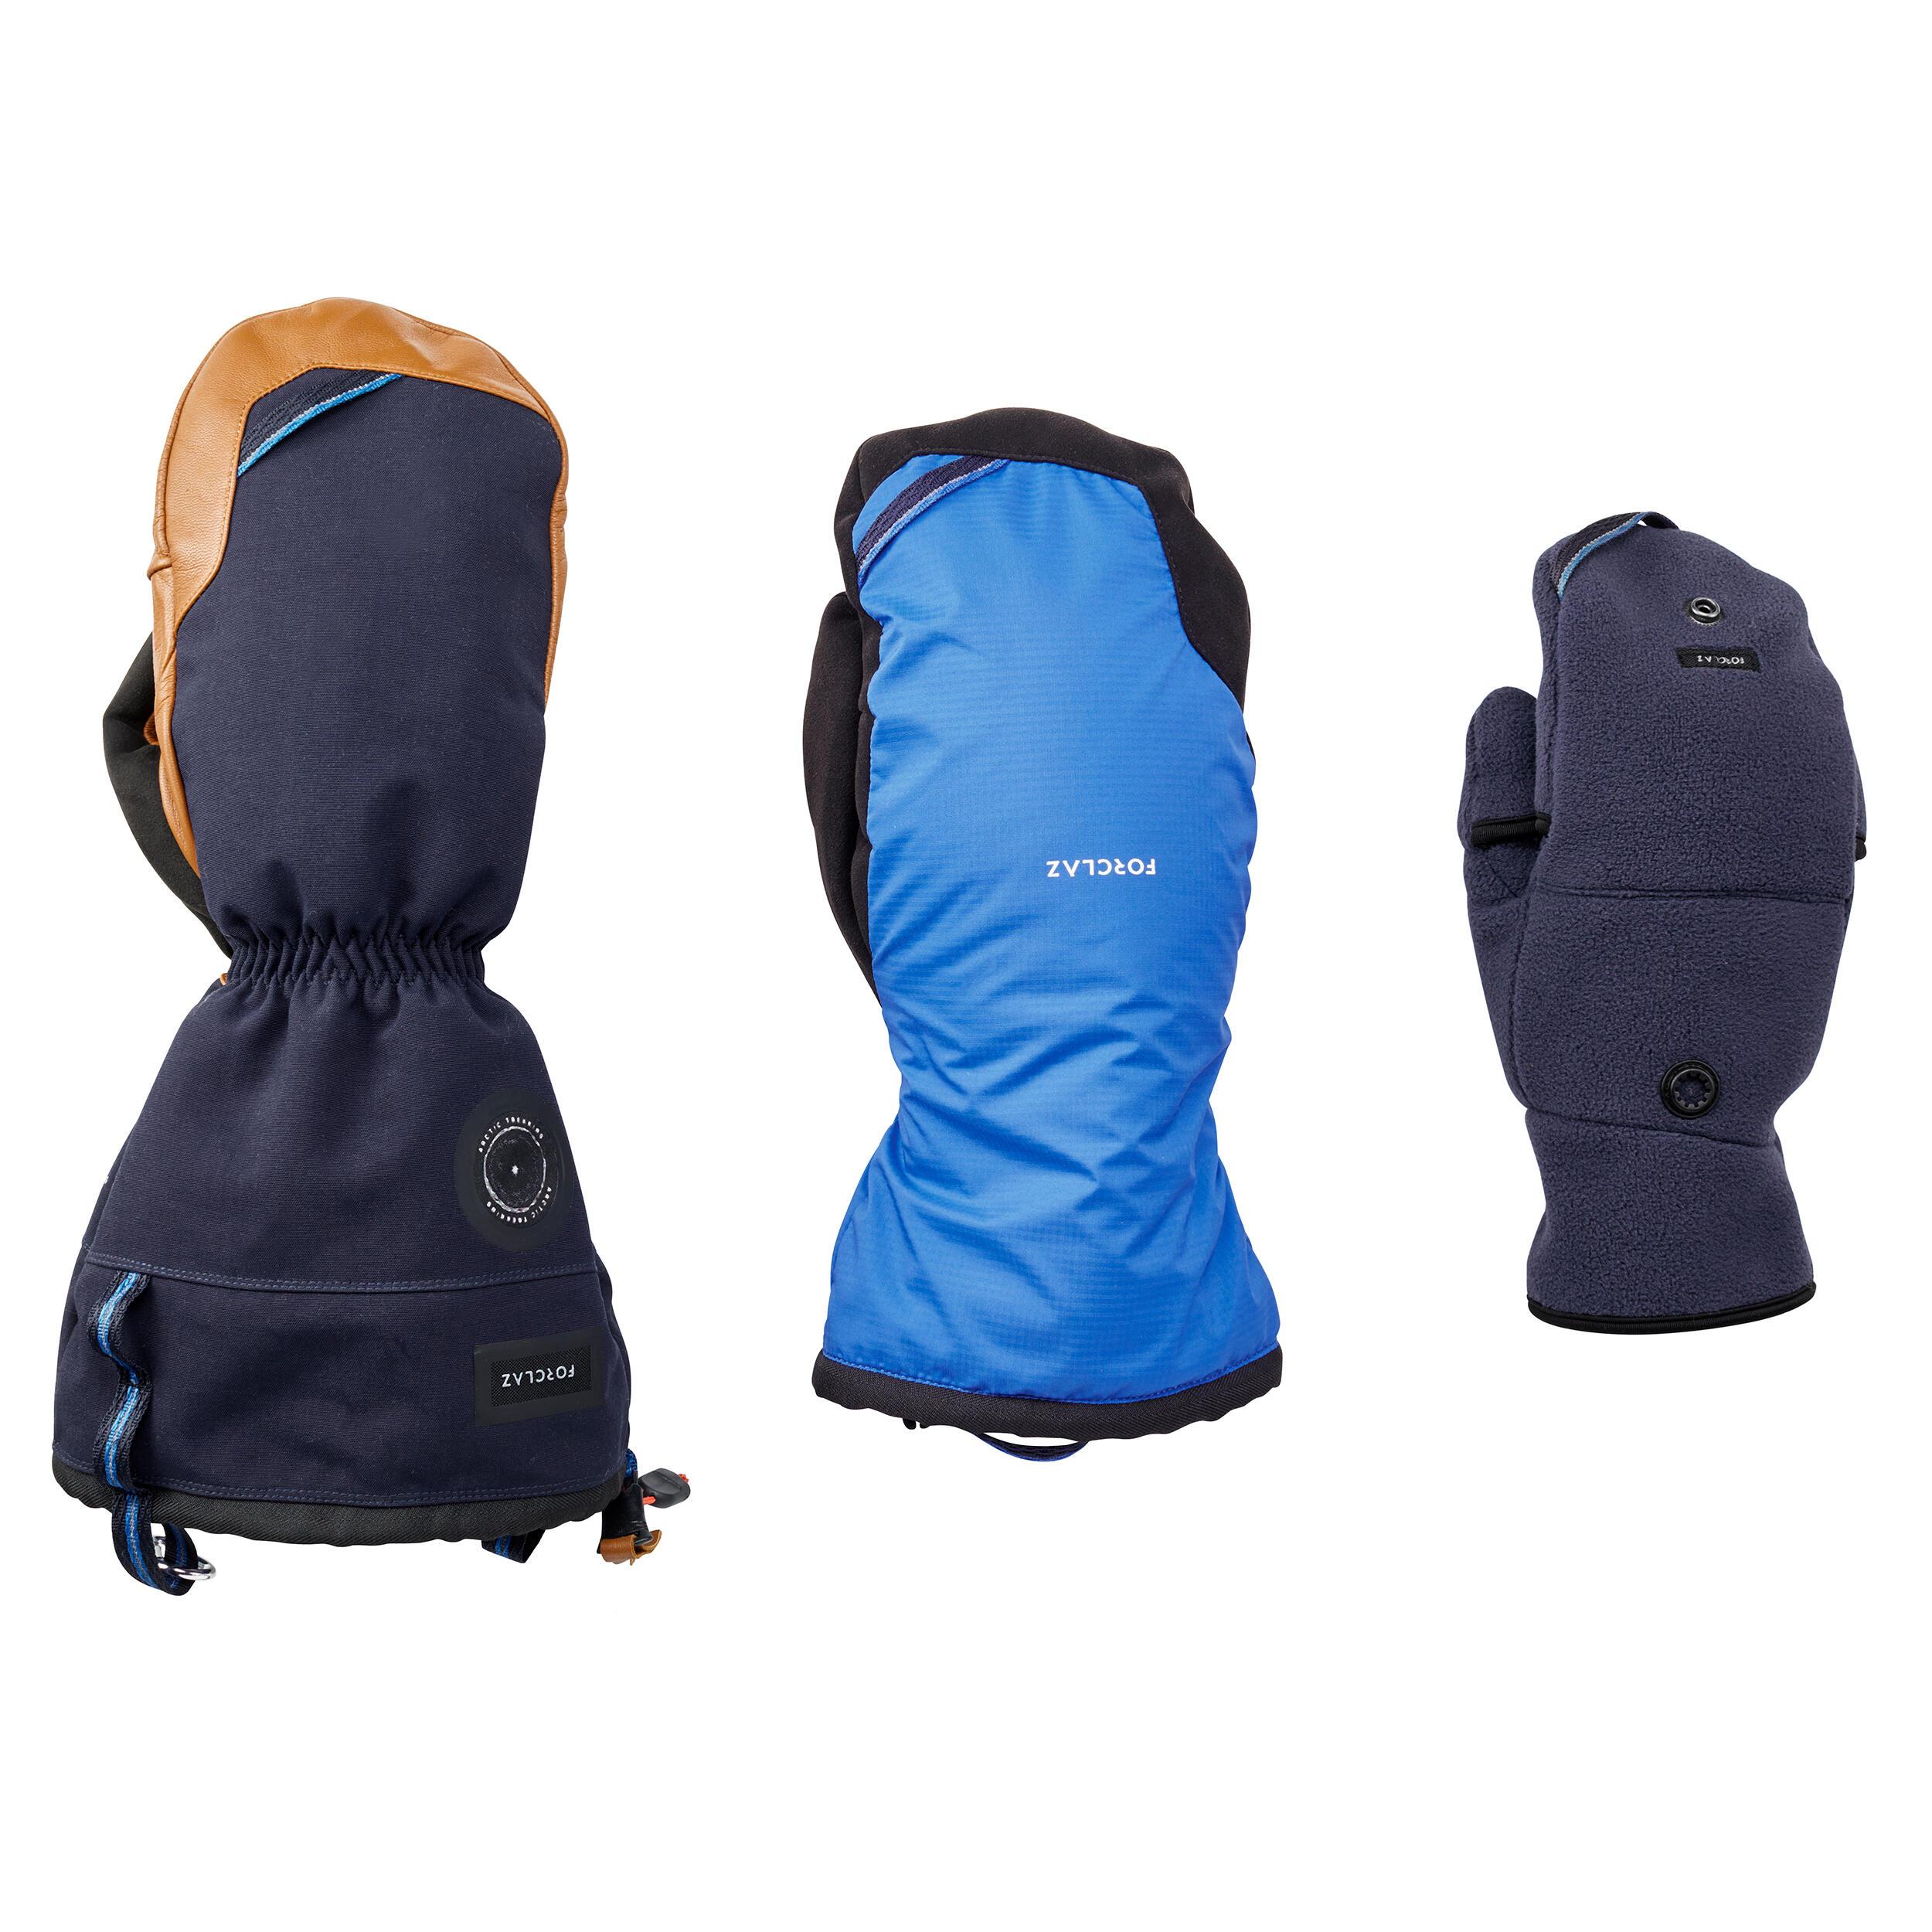 Fäustlinge Arctic Trekking MITT 500 | Accessoires > Handschuhe | Forclaz